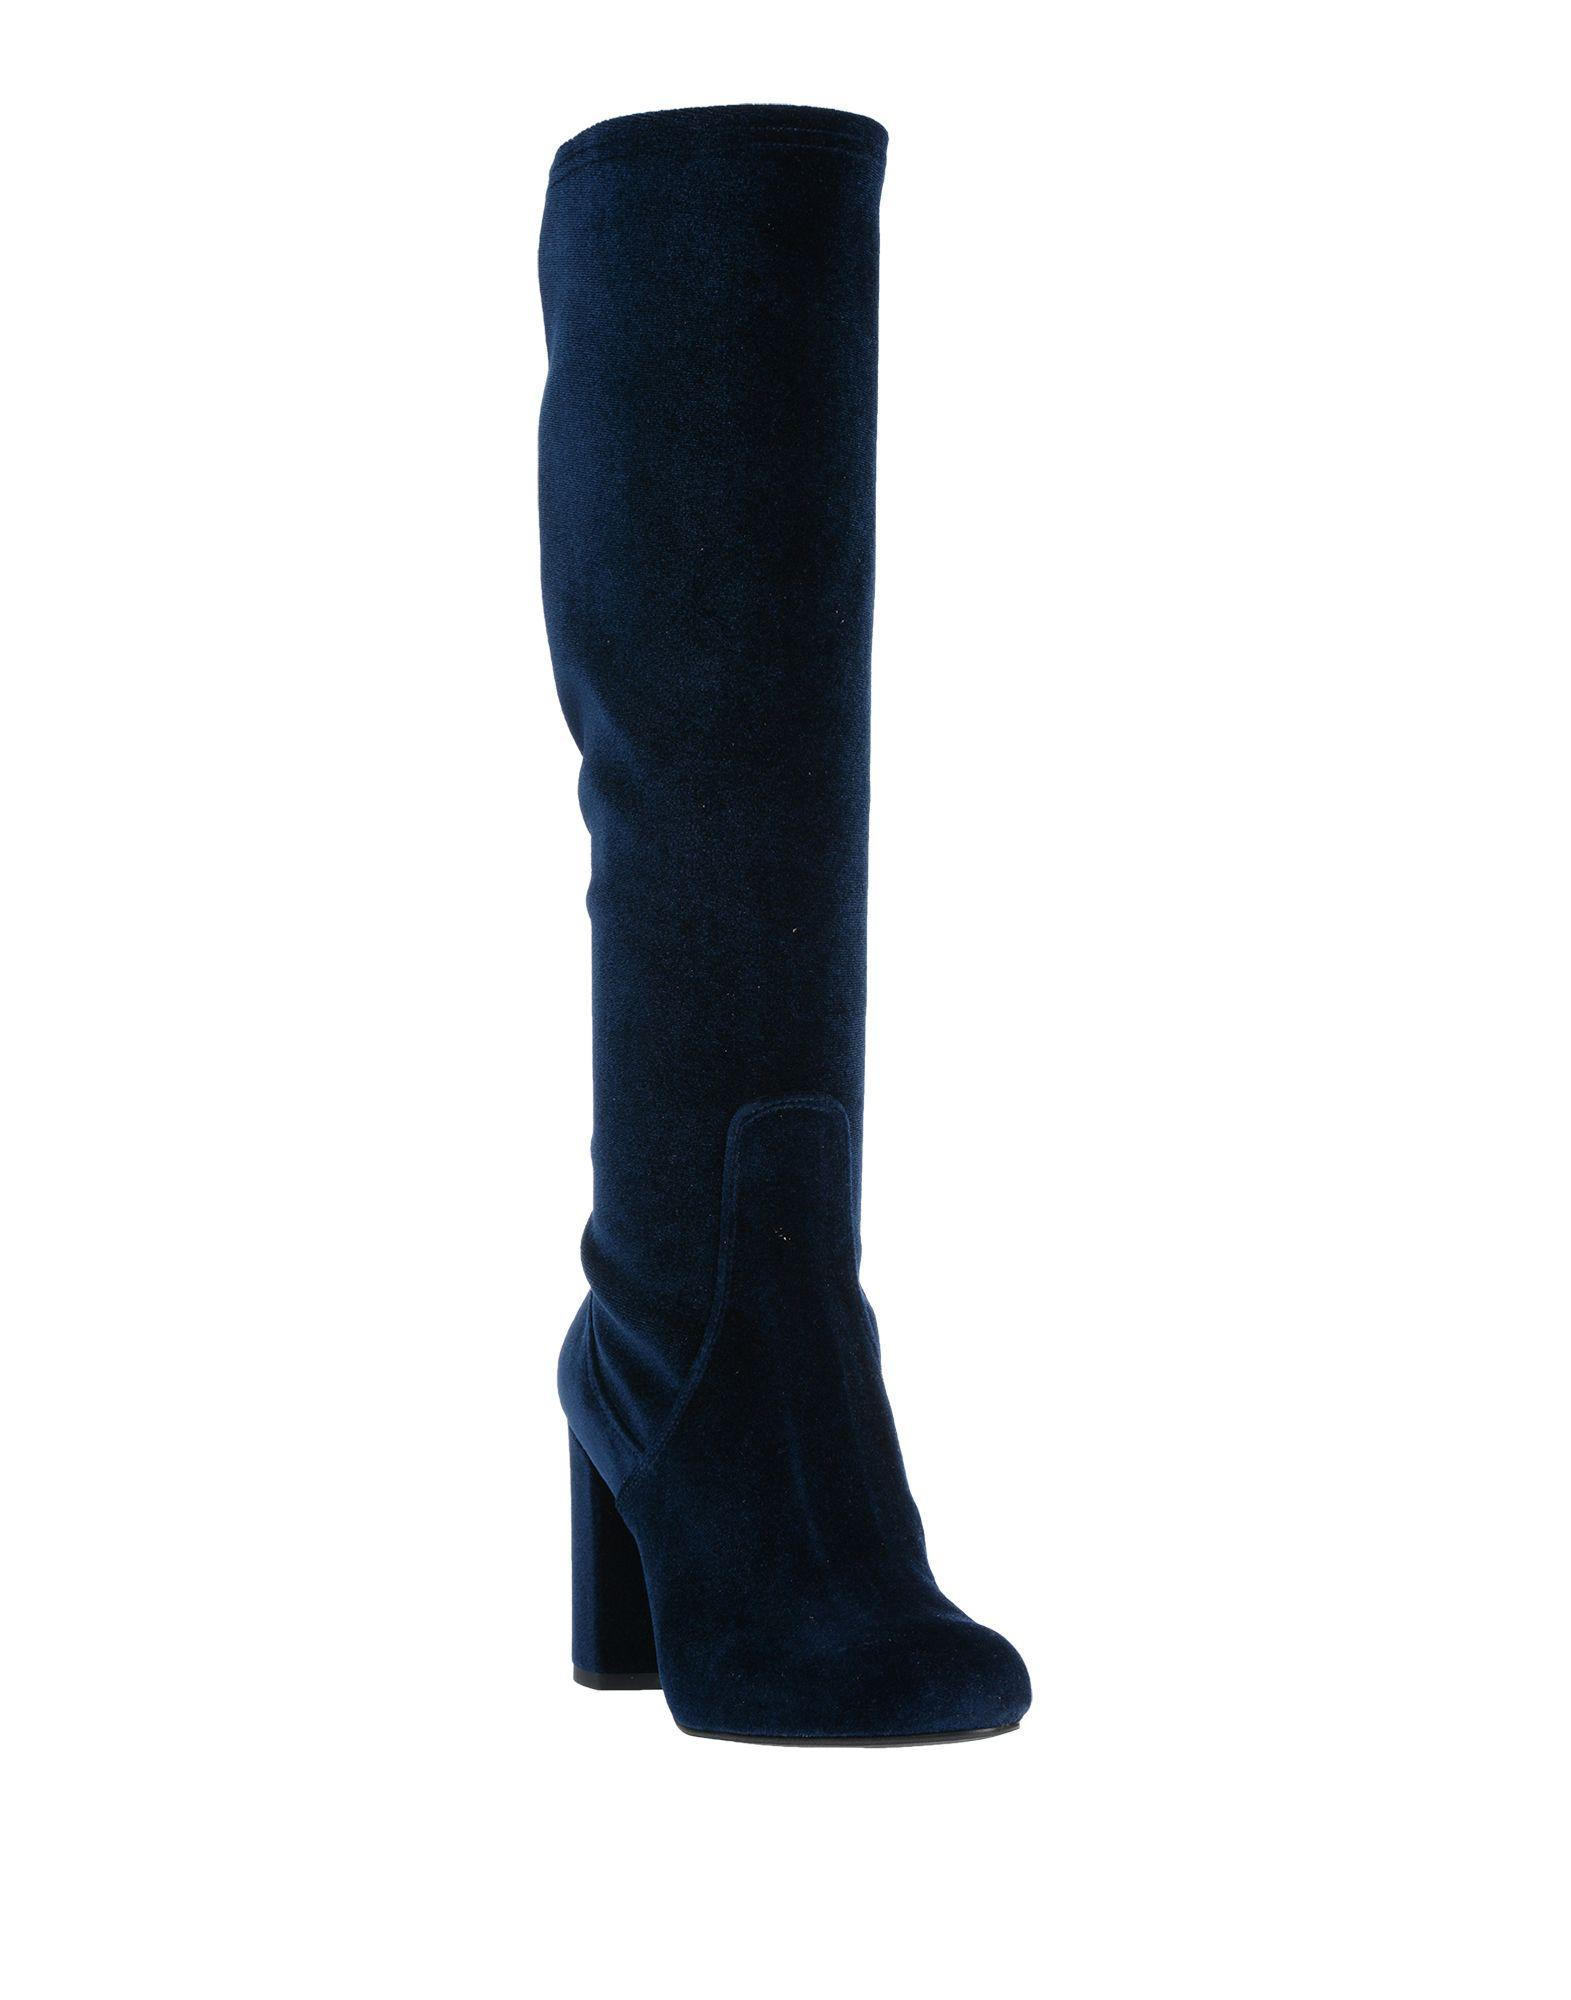 Botas Stele de Terciopelo de color Azul